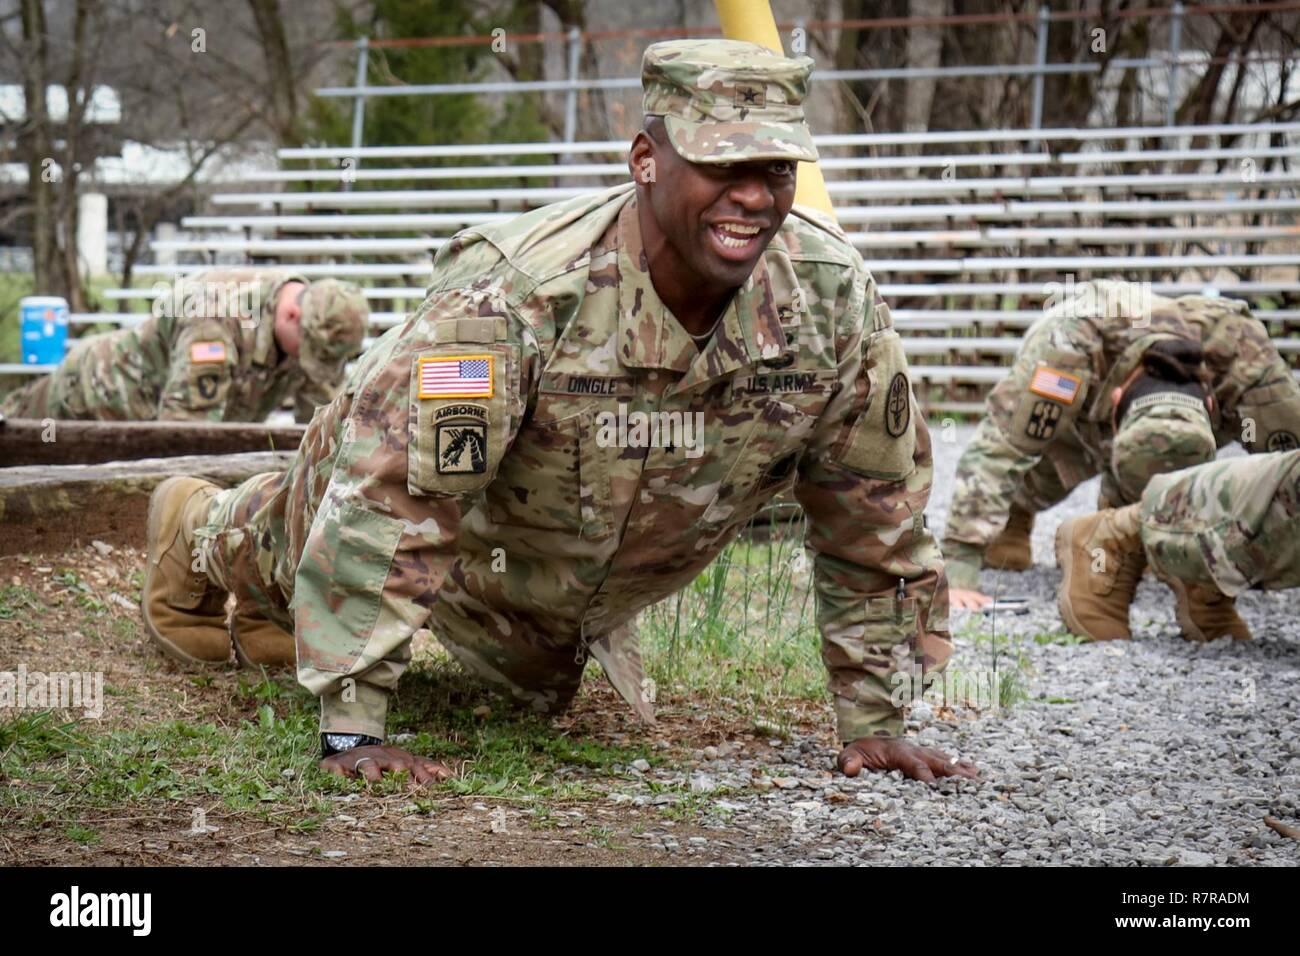 Brig Gen R Scott Dingle Comandante De La Salud Regional